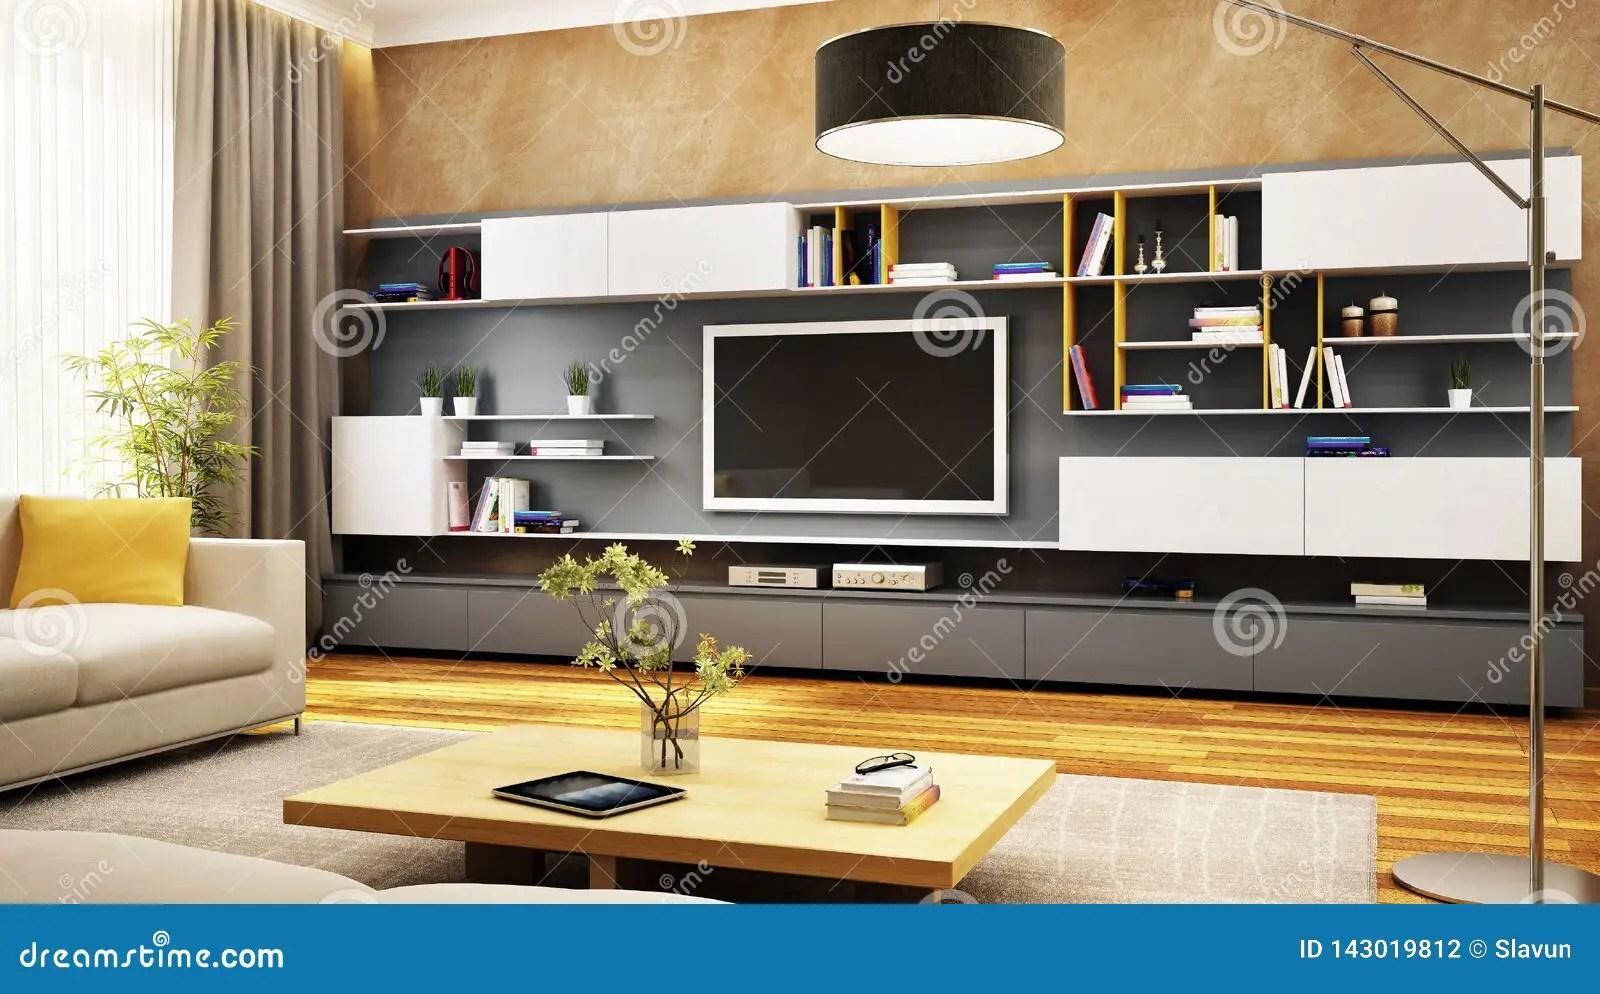 https fr dreamstime com armoire moderne tv salon luxe image143019812